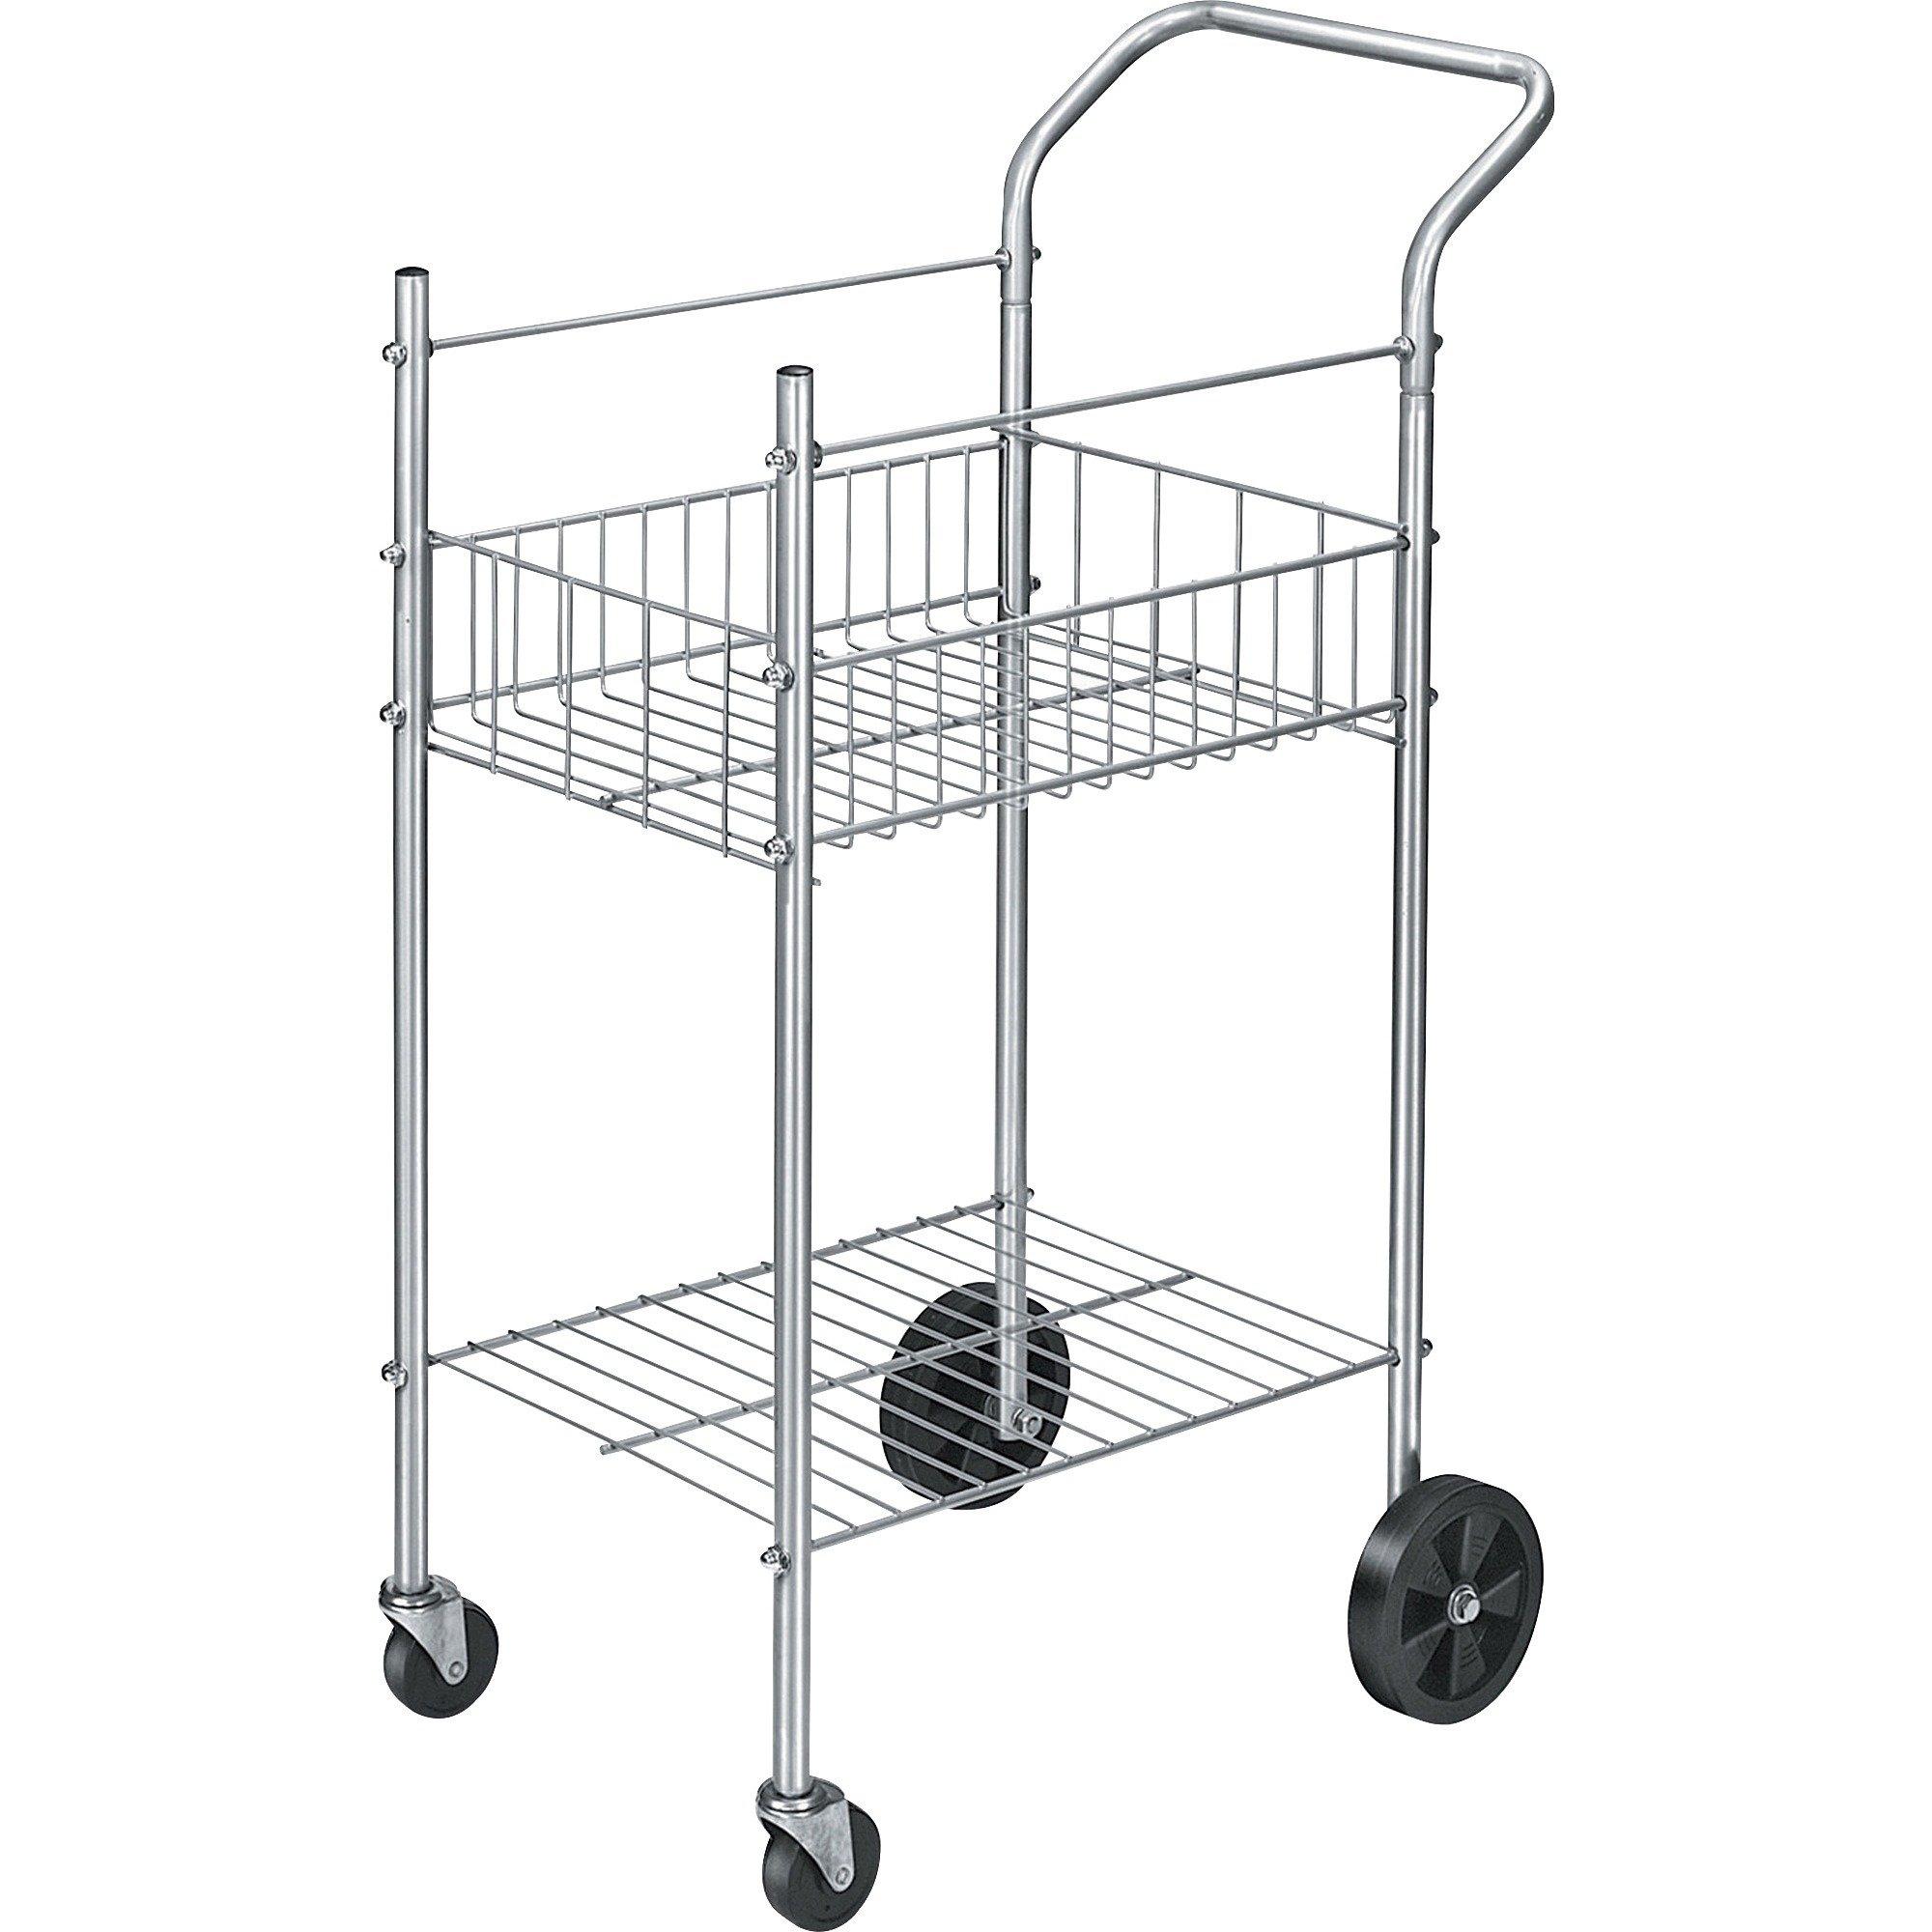 Economy Office Cart, 1 Each, Silver by Aromzen